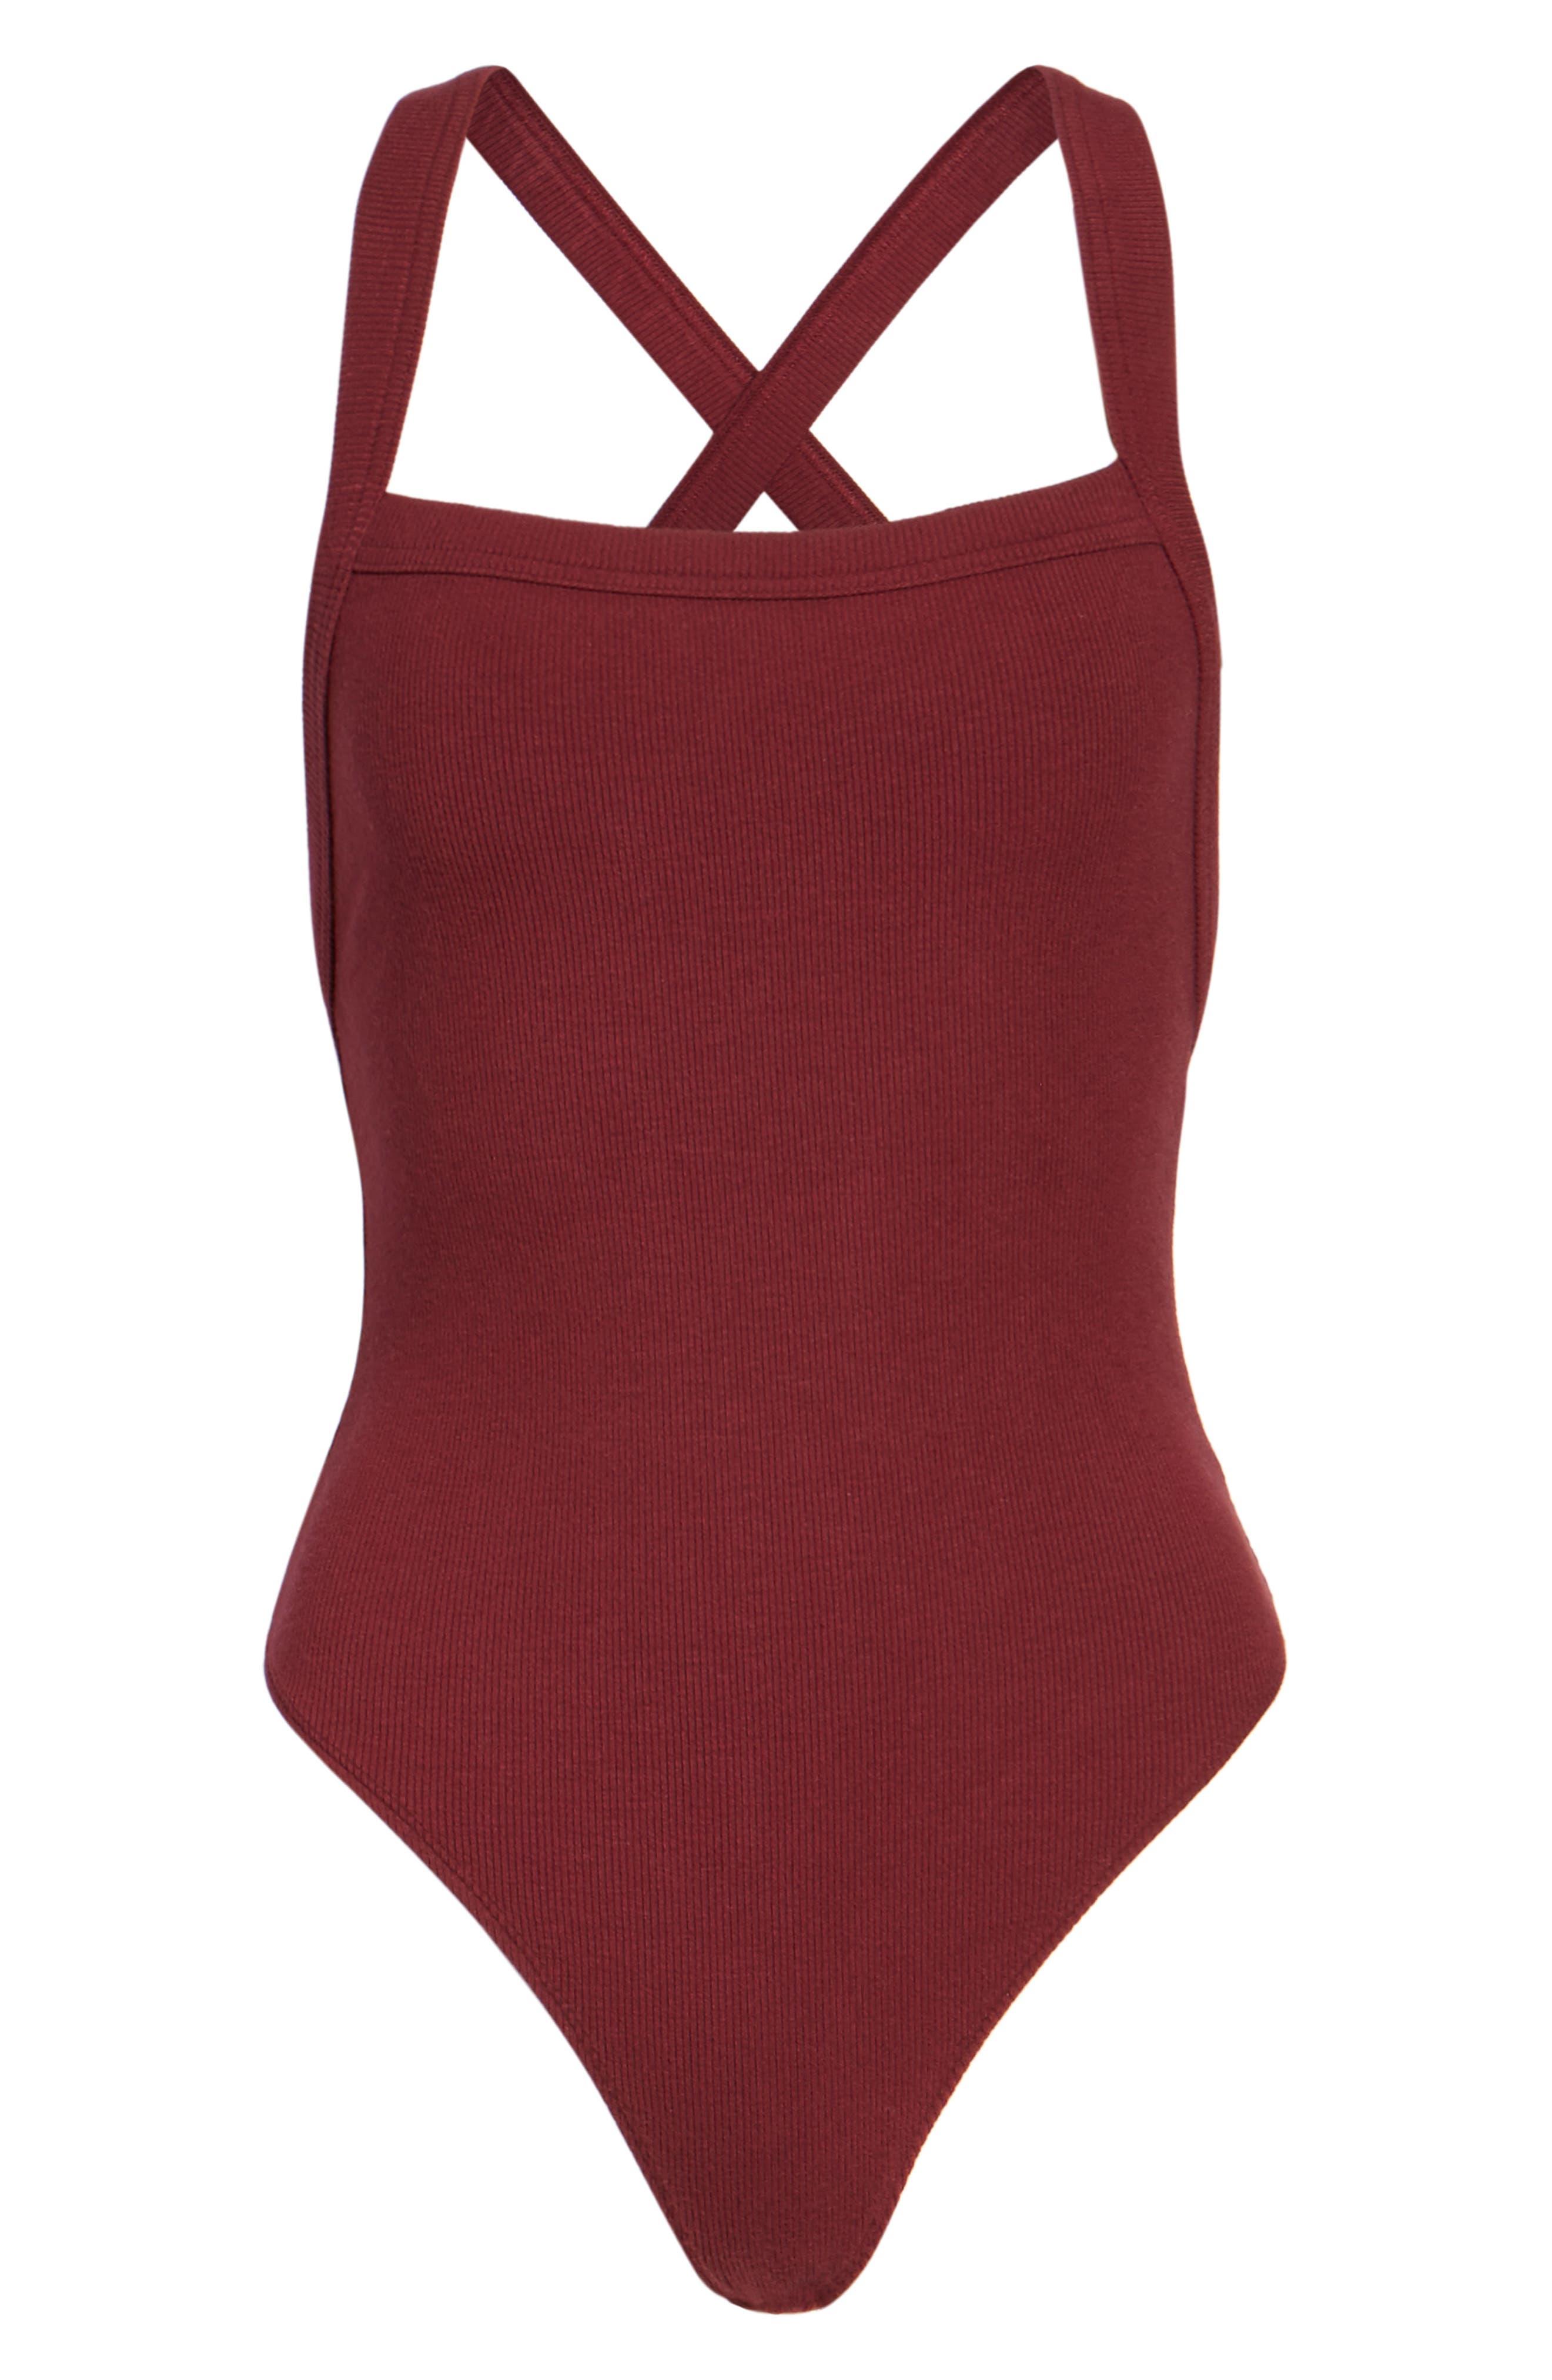 Thong Bodysuit,                             Alternate thumbnail 6, color,                             Burgundy